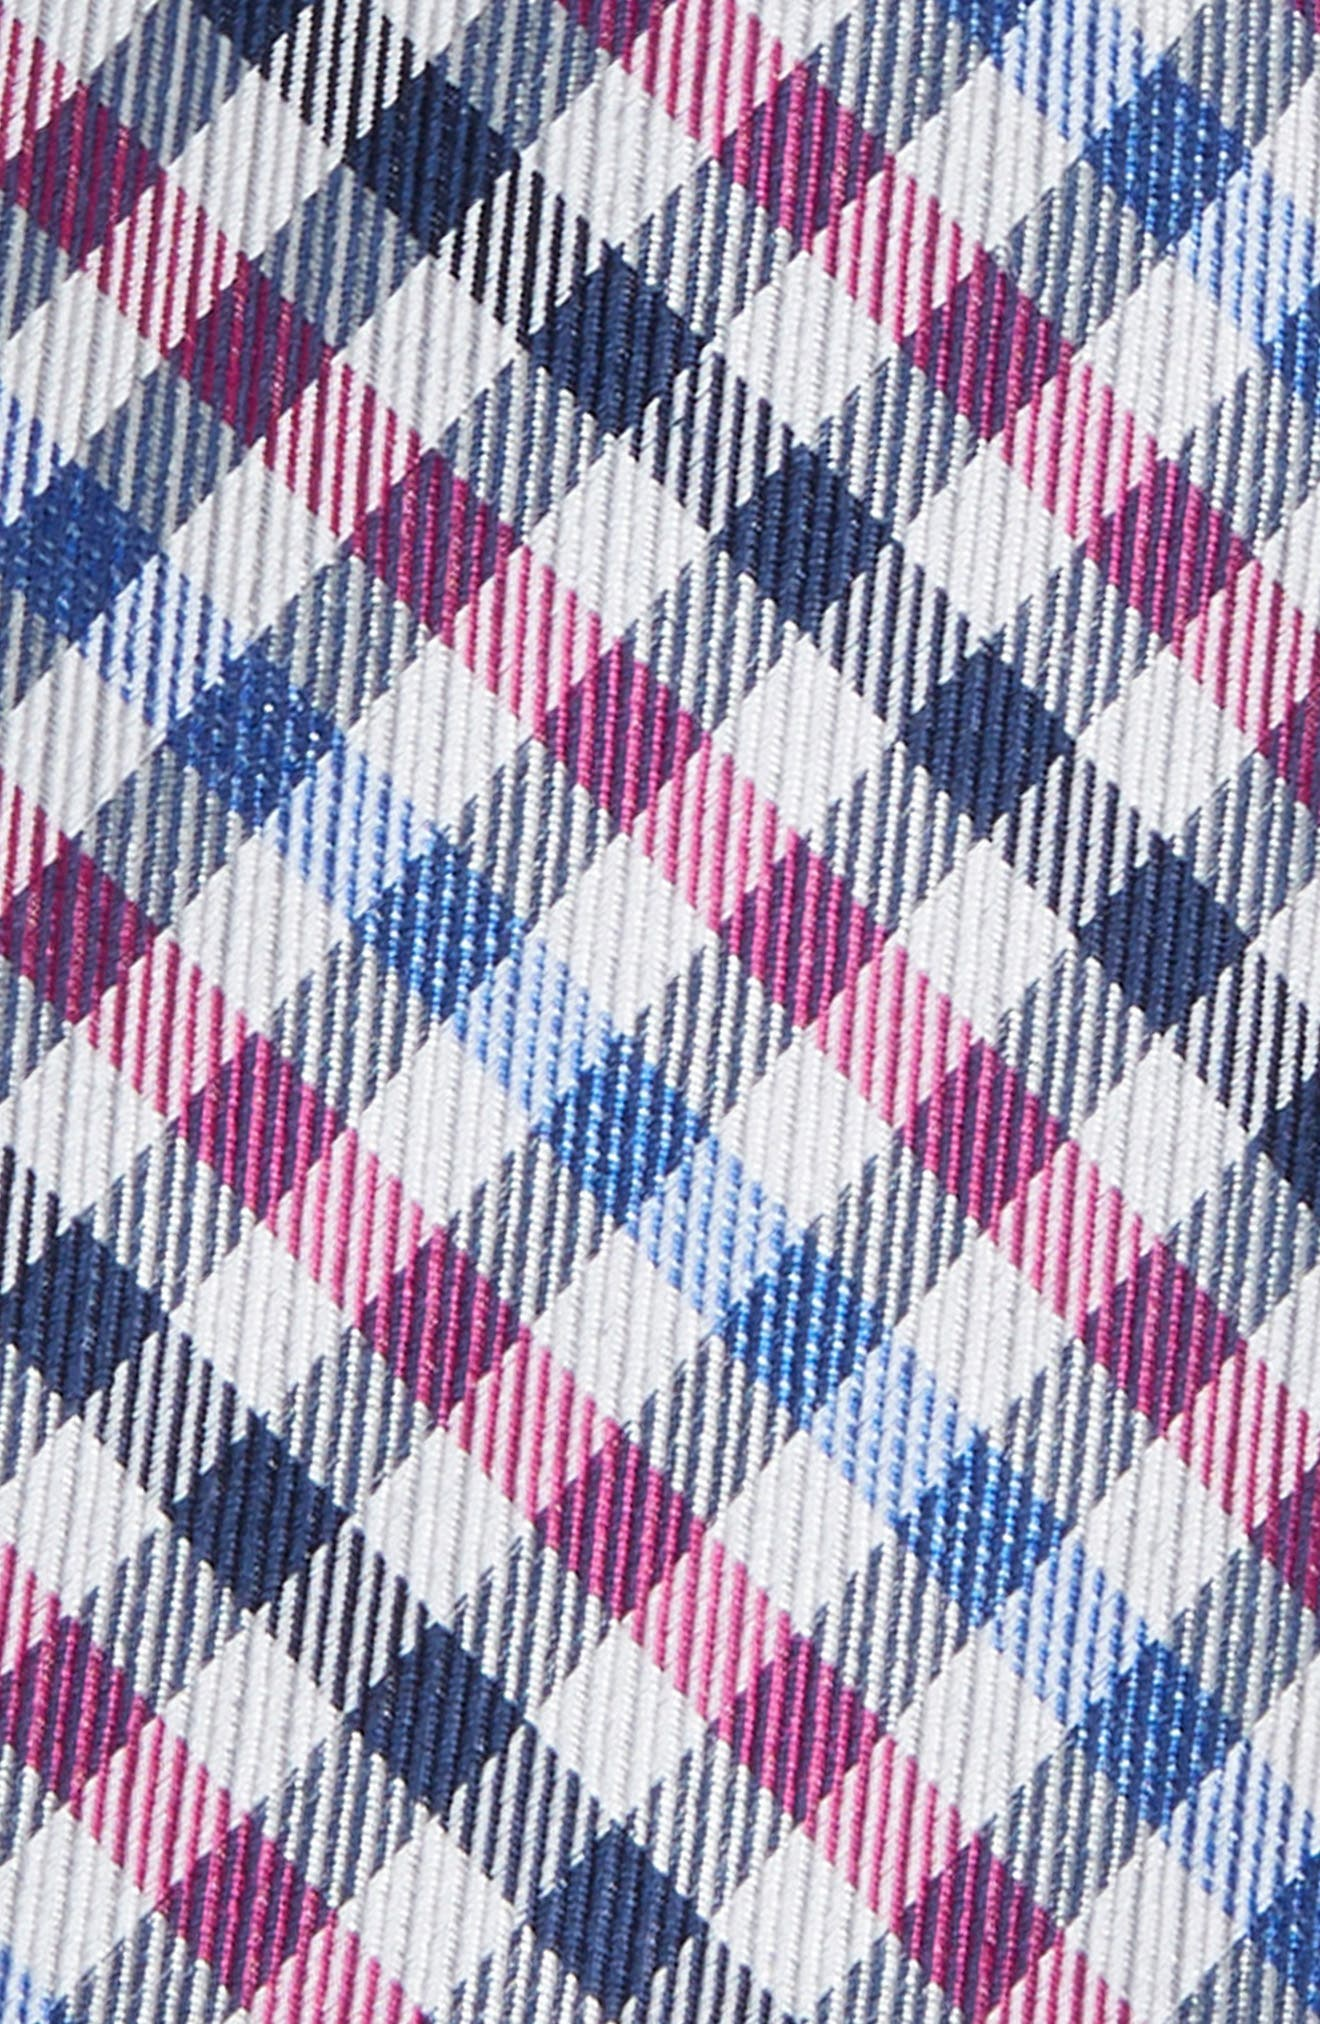 MICHAEL KORS,                             Check Silk Tie,                             Alternate thumbnail 2, color,                             FUCHSIA